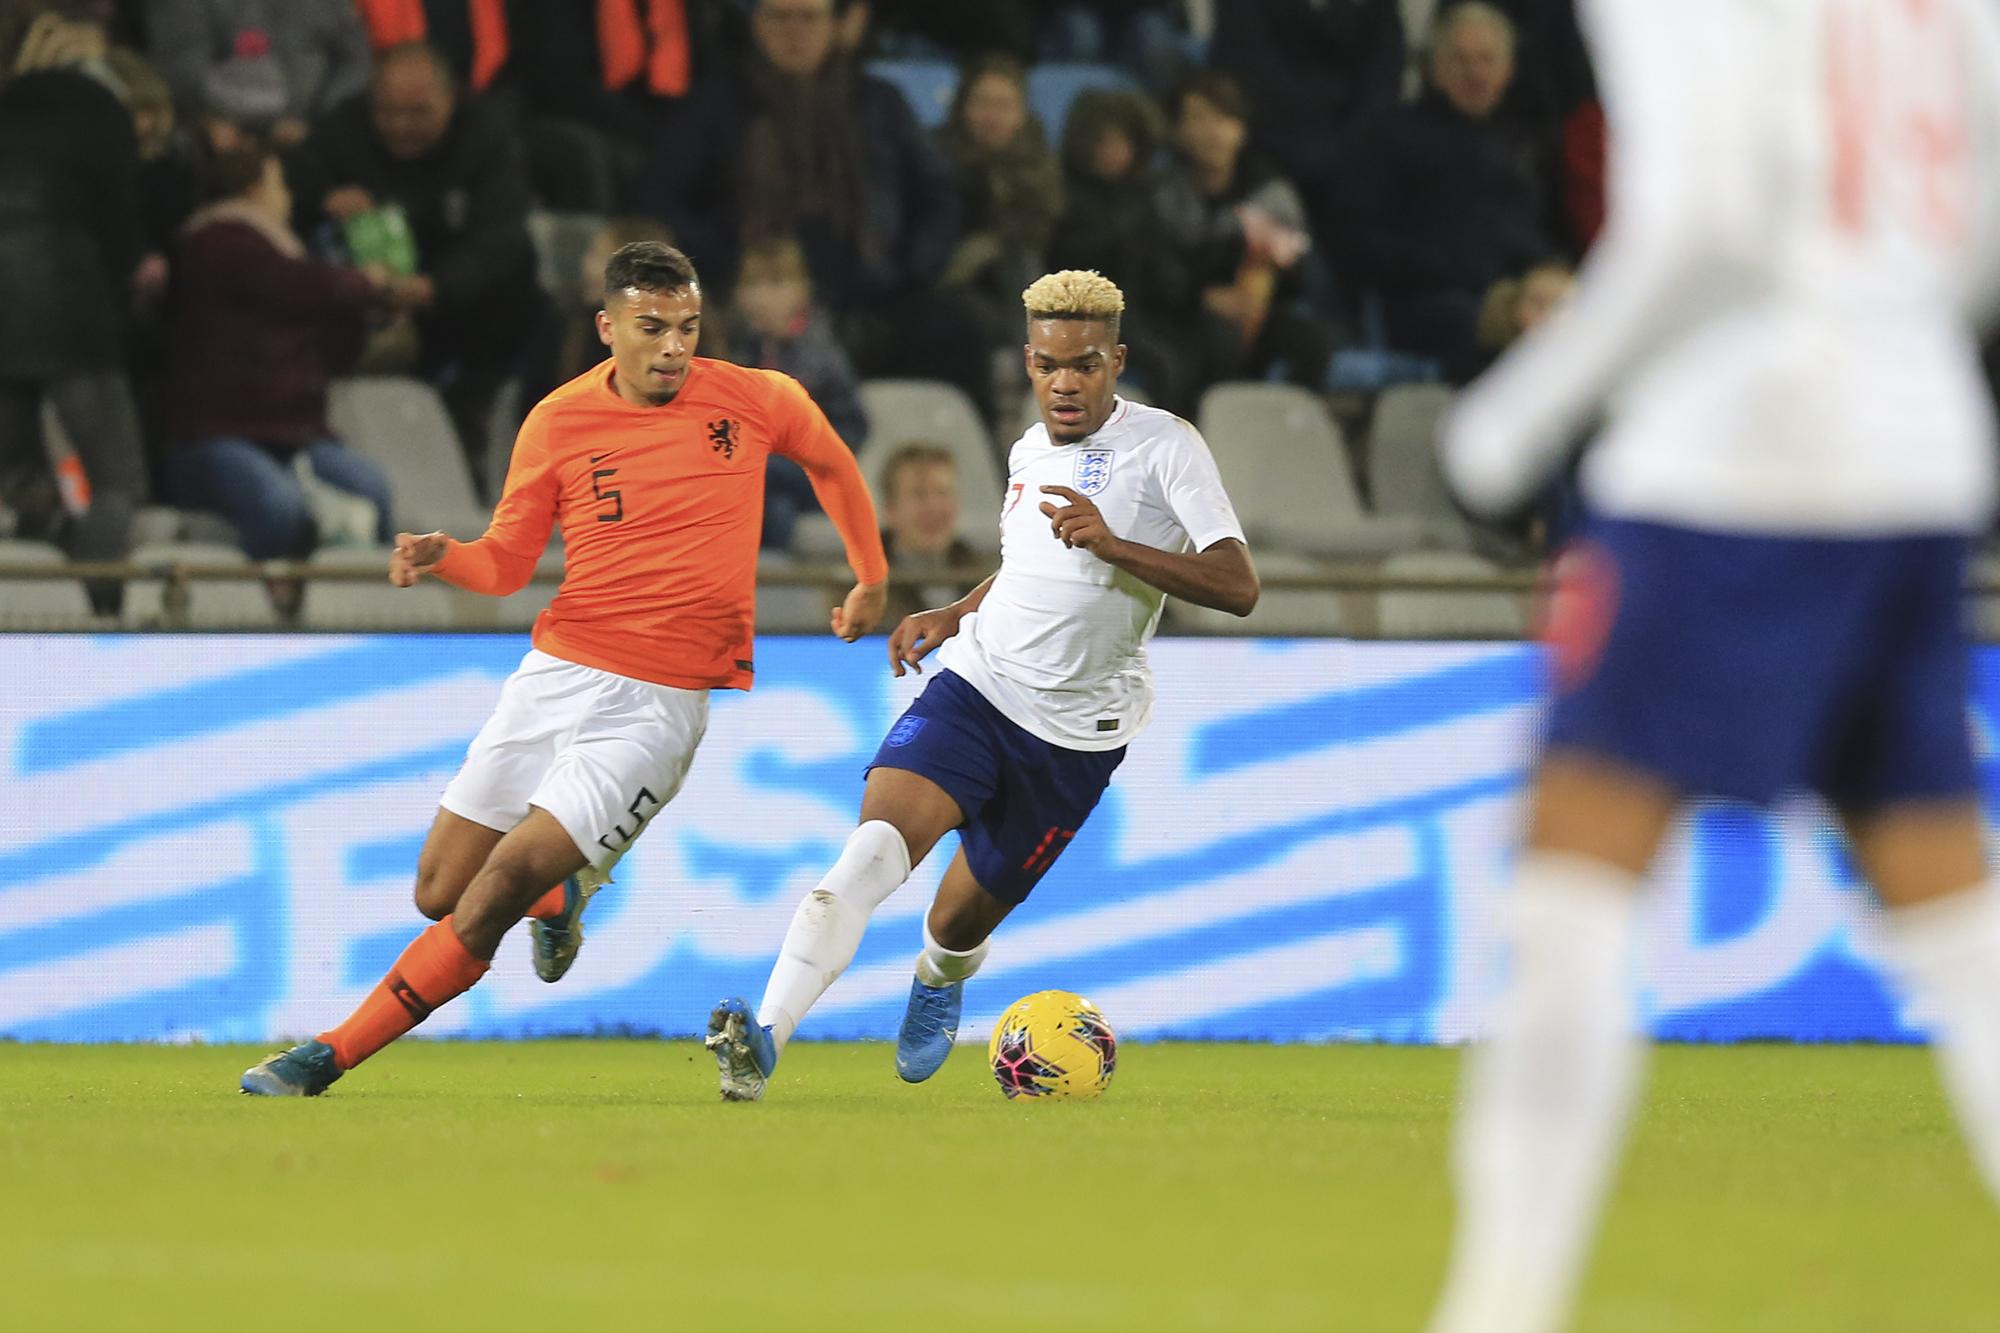 Jong-Oranje-vs-Engeland-6.jpg